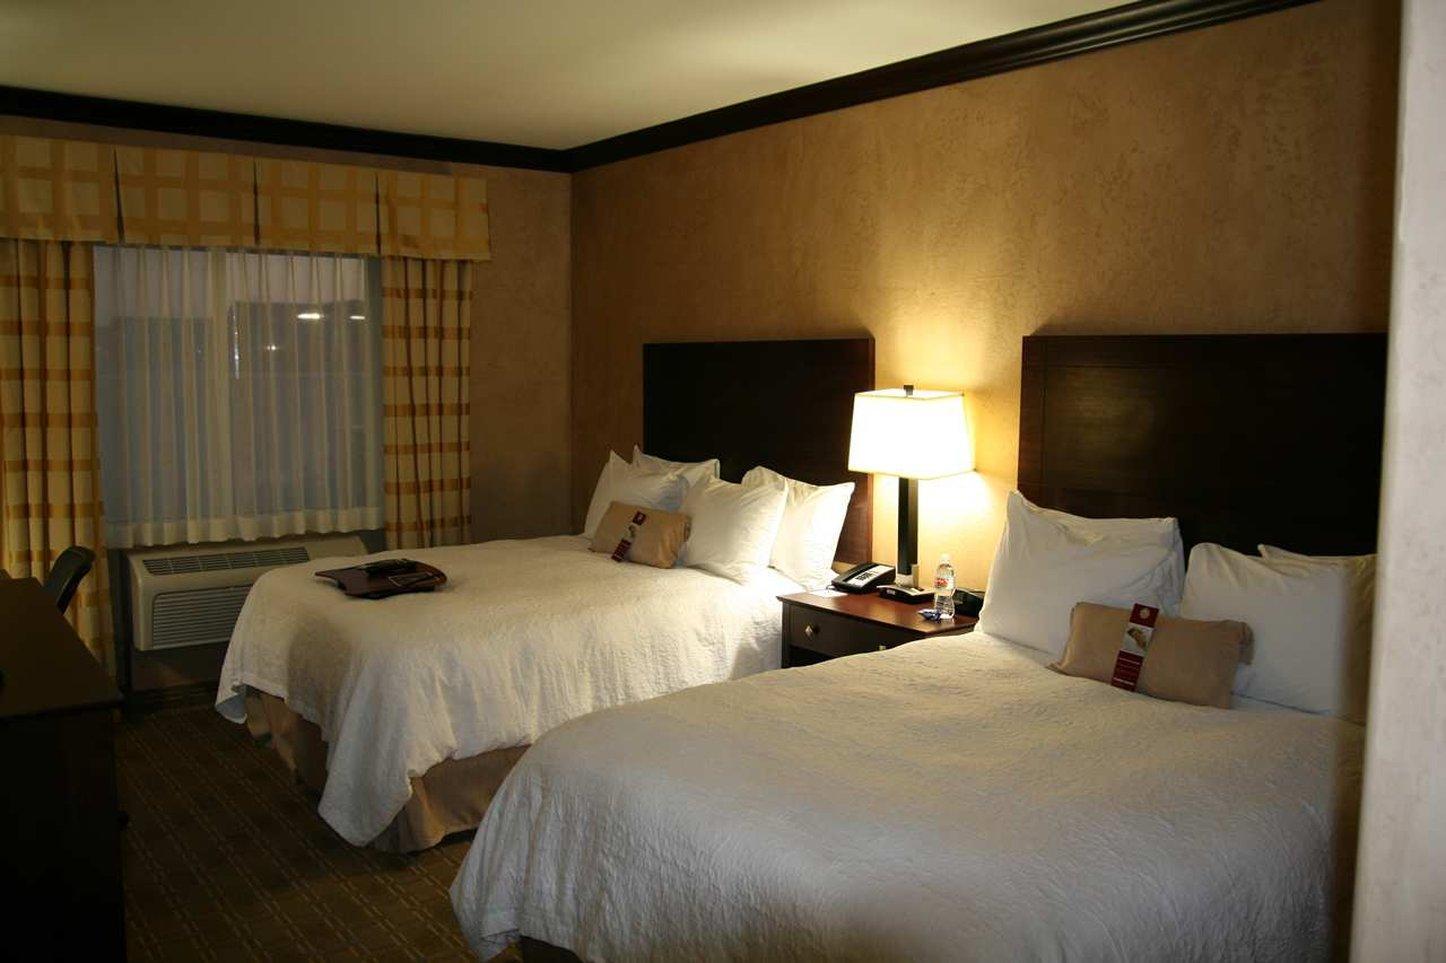 Hampton Inn & Suites Fort Worth Fossil Creek